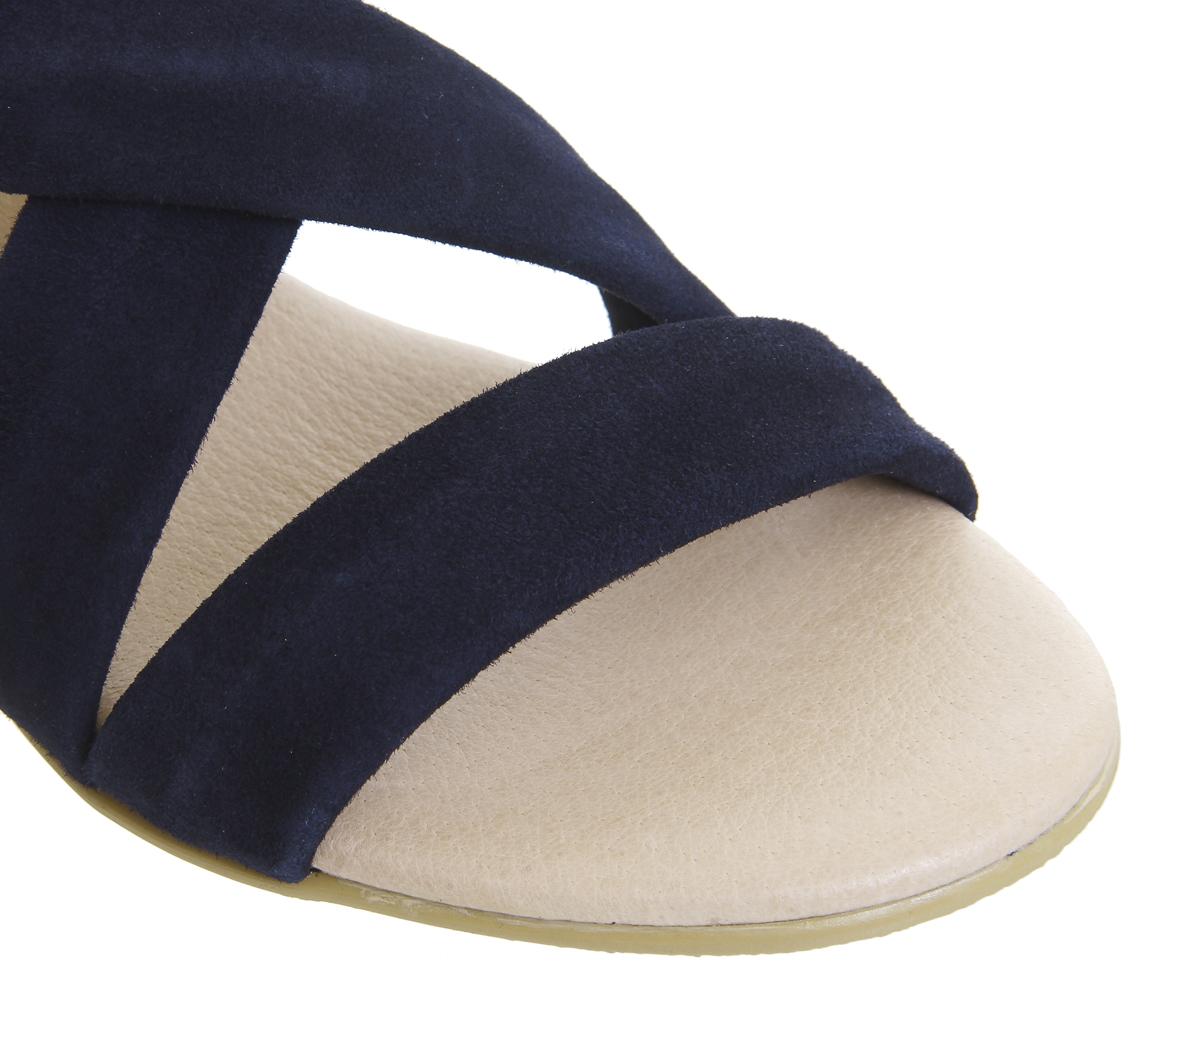 Womens Office Hallie Cross Strap Espadrilles Navy Suede Sandals